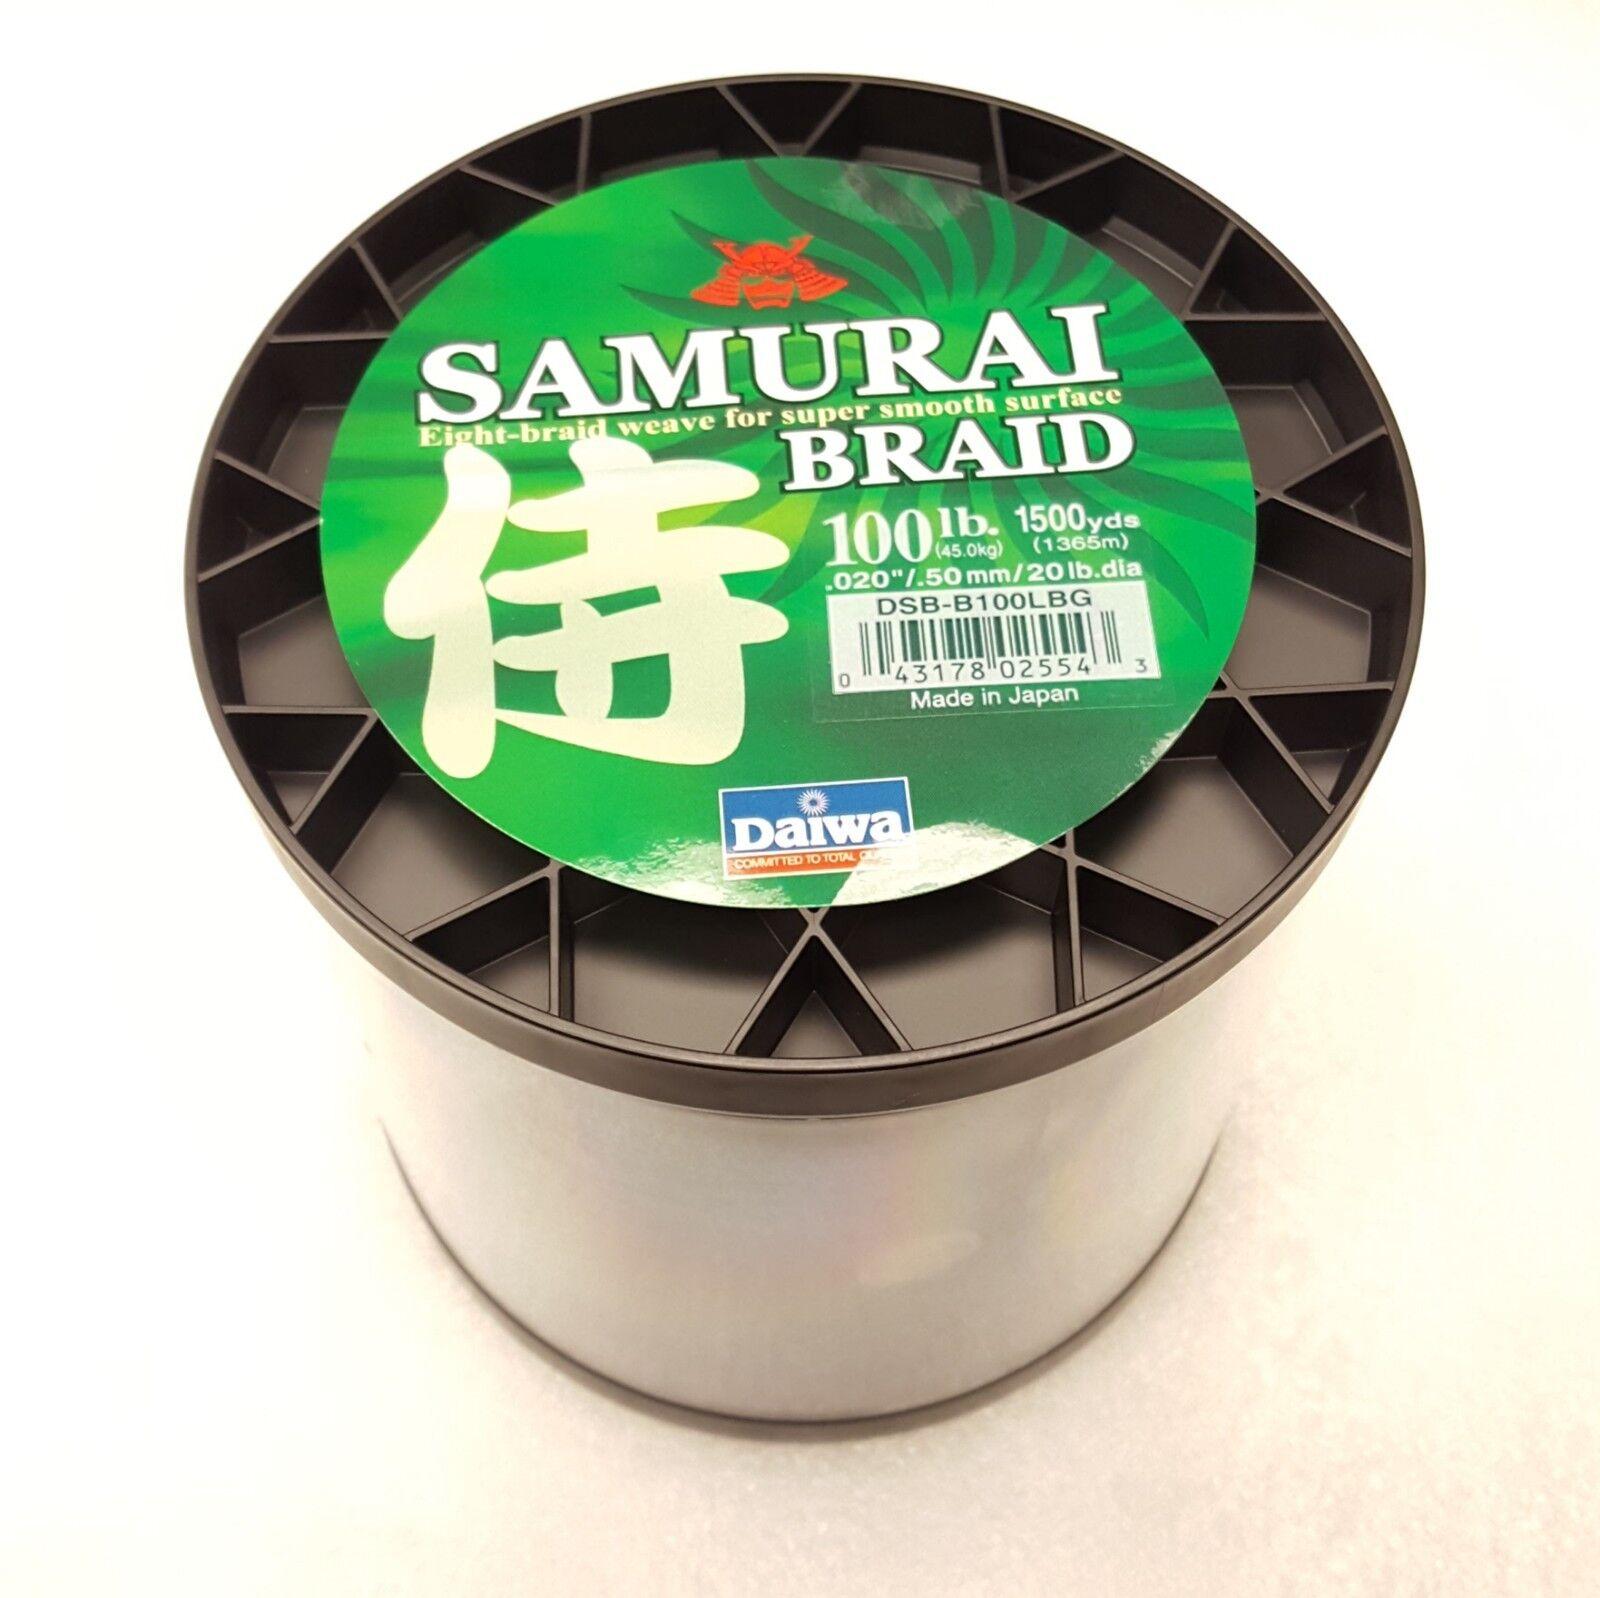 Daiwa Samurai Braided Line  Dark verde 100lb Test, 1500 yards  DSBB100LBG